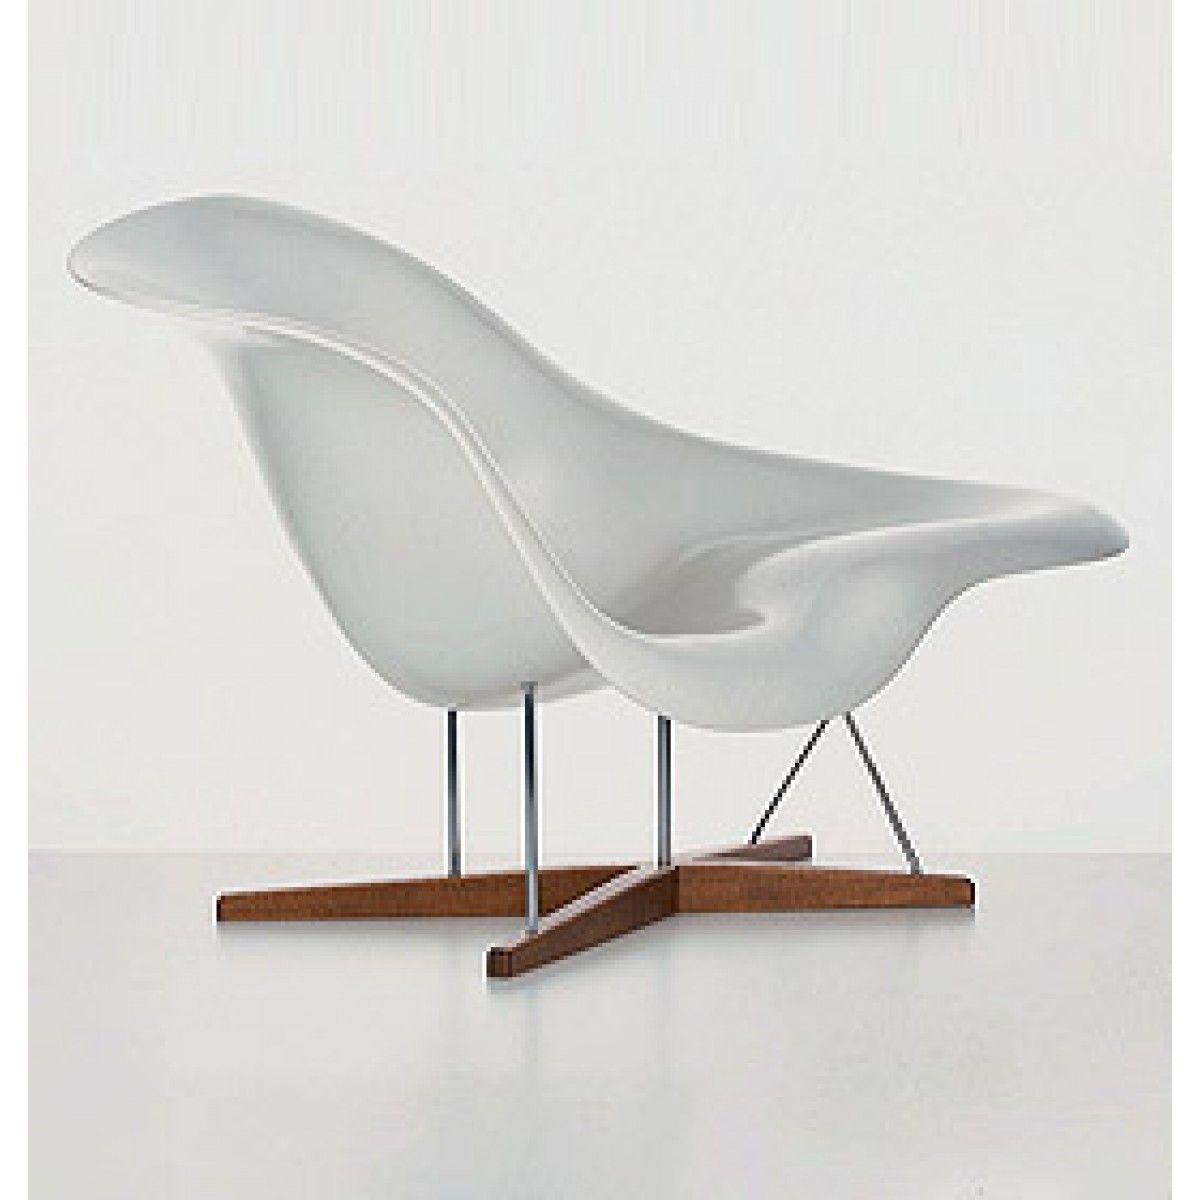 La Chaise Liege Vitra Designed By Charles Amp Ray Eames Ab 7 258 10 Chf Bestpreis Garantie Versandkostenfrei 28 Tage Ruckgabe 3 R Stuhle Chaise Eames